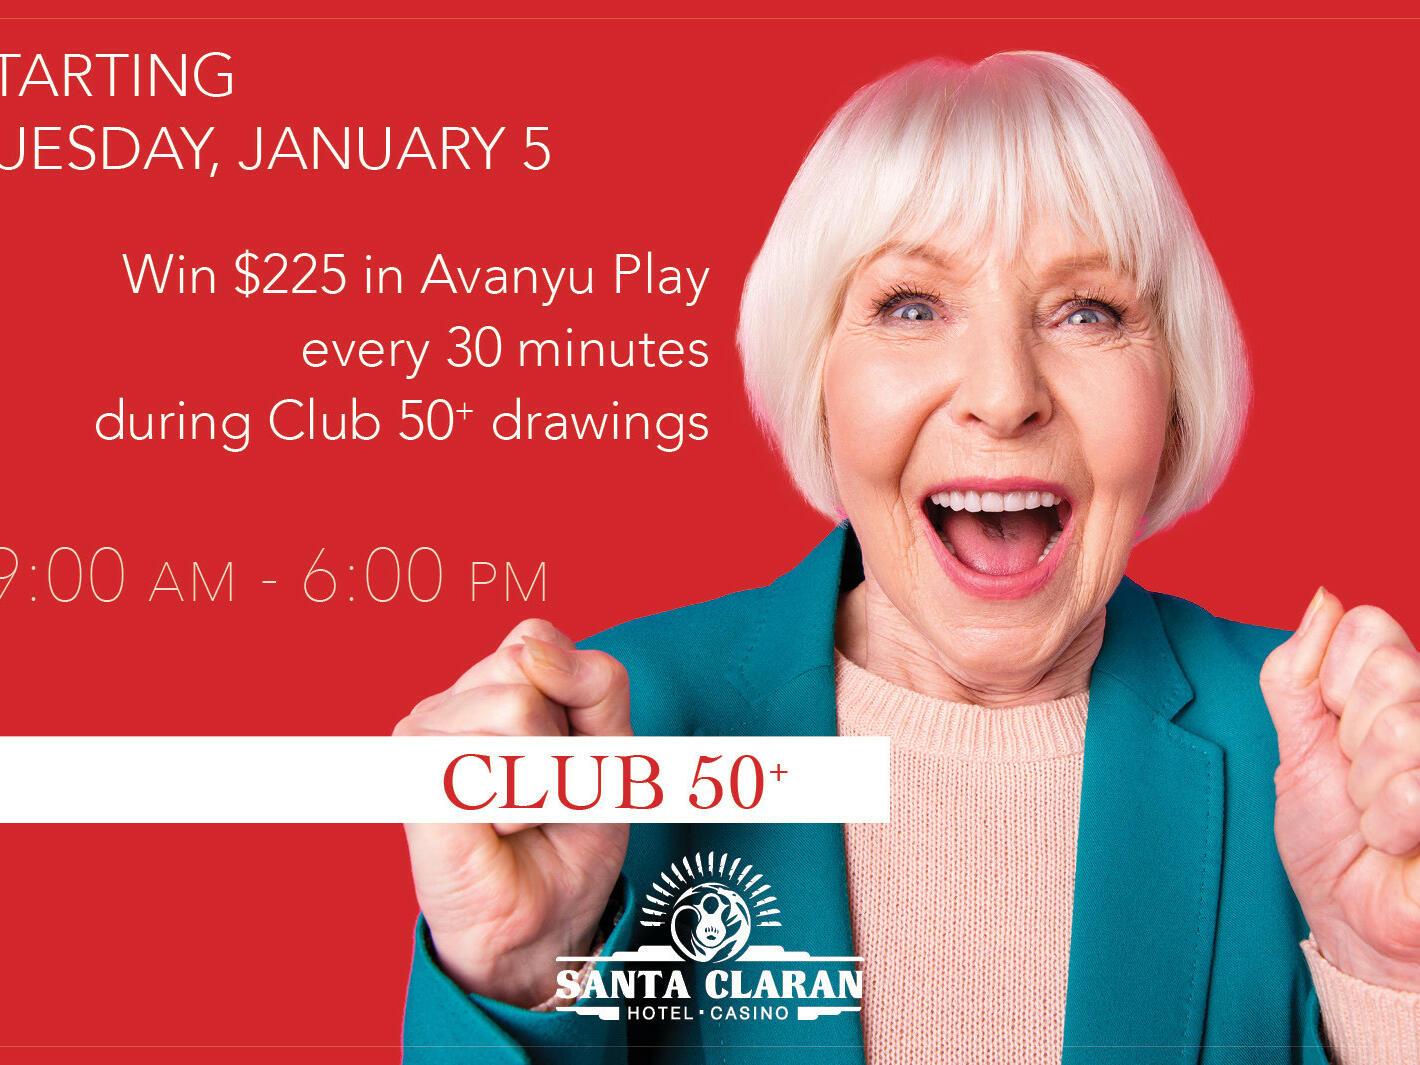 Poster of CLUB 50+ at Santa Claran Hotel Casino